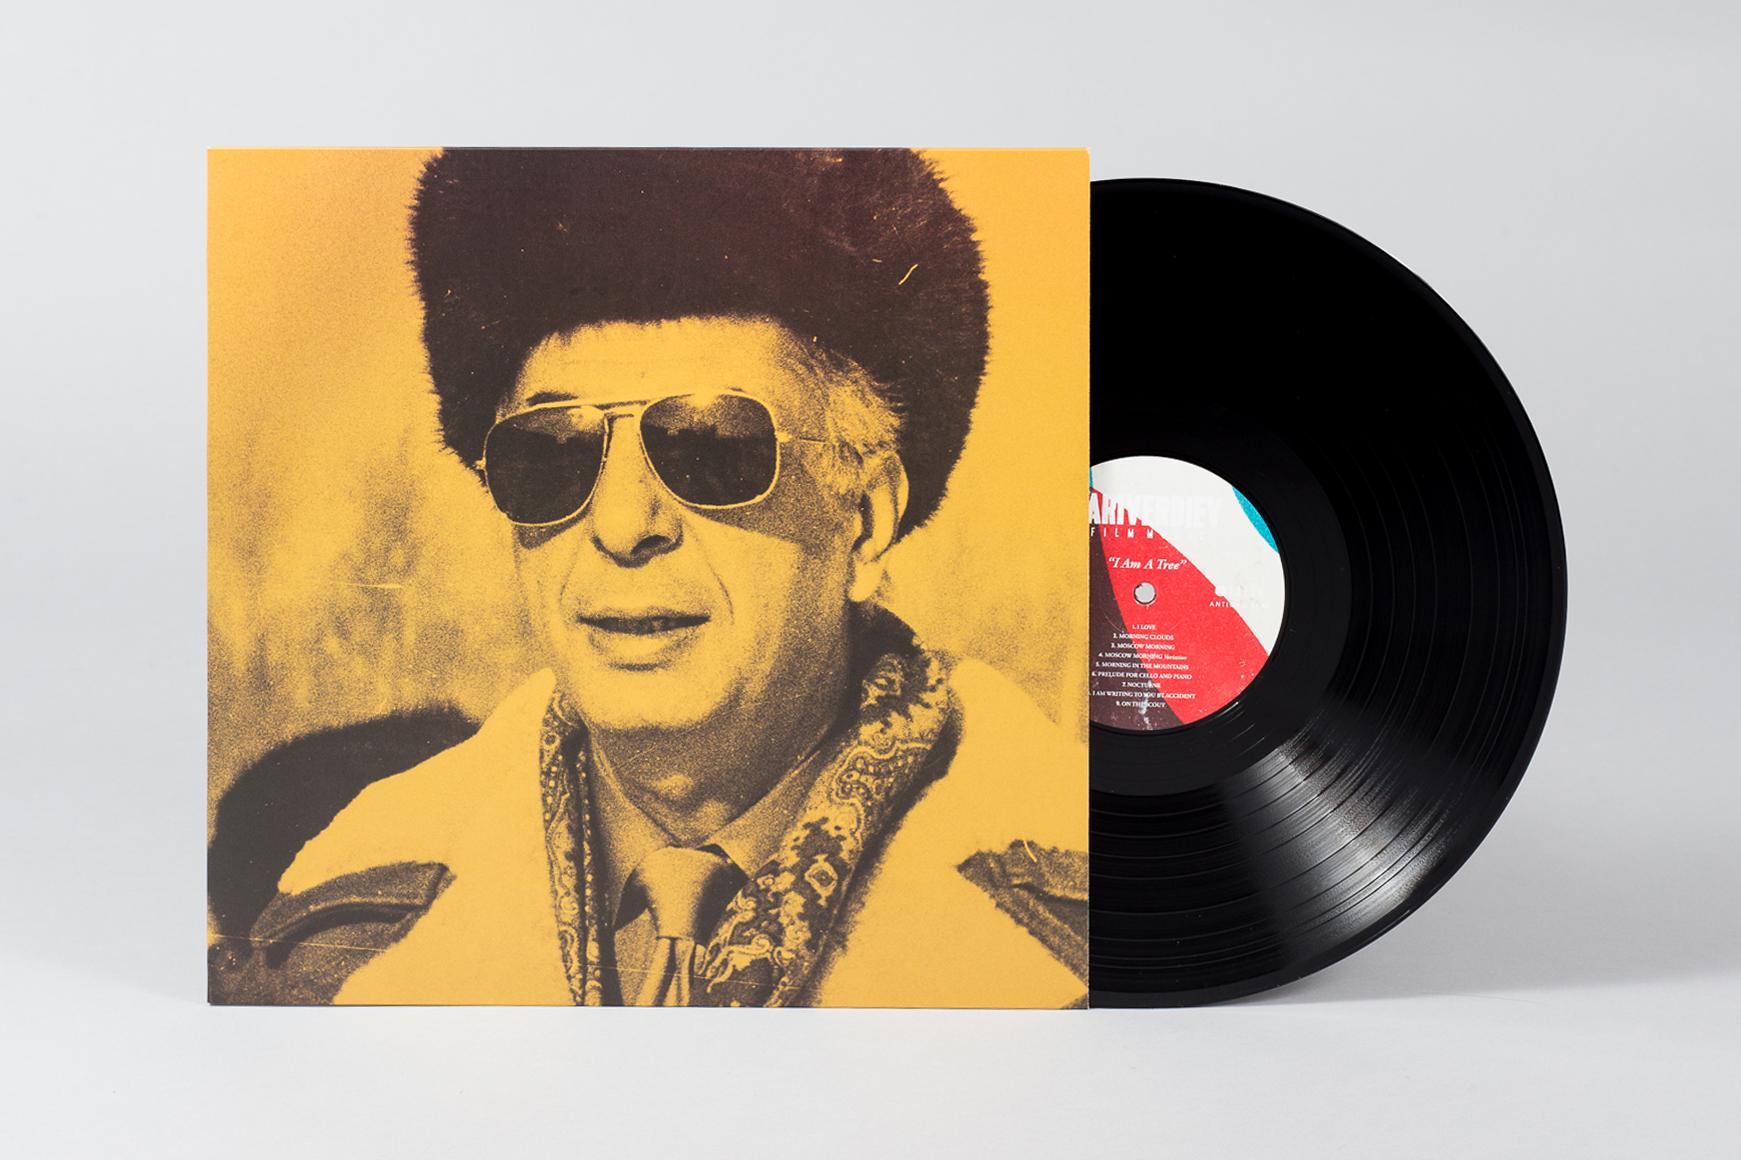 ©-The-Vinyl-Factory-Tariverdiev-Vinyl-Release-Photography-Michael-Wilkin_0002_new11-1-of-1.jpg